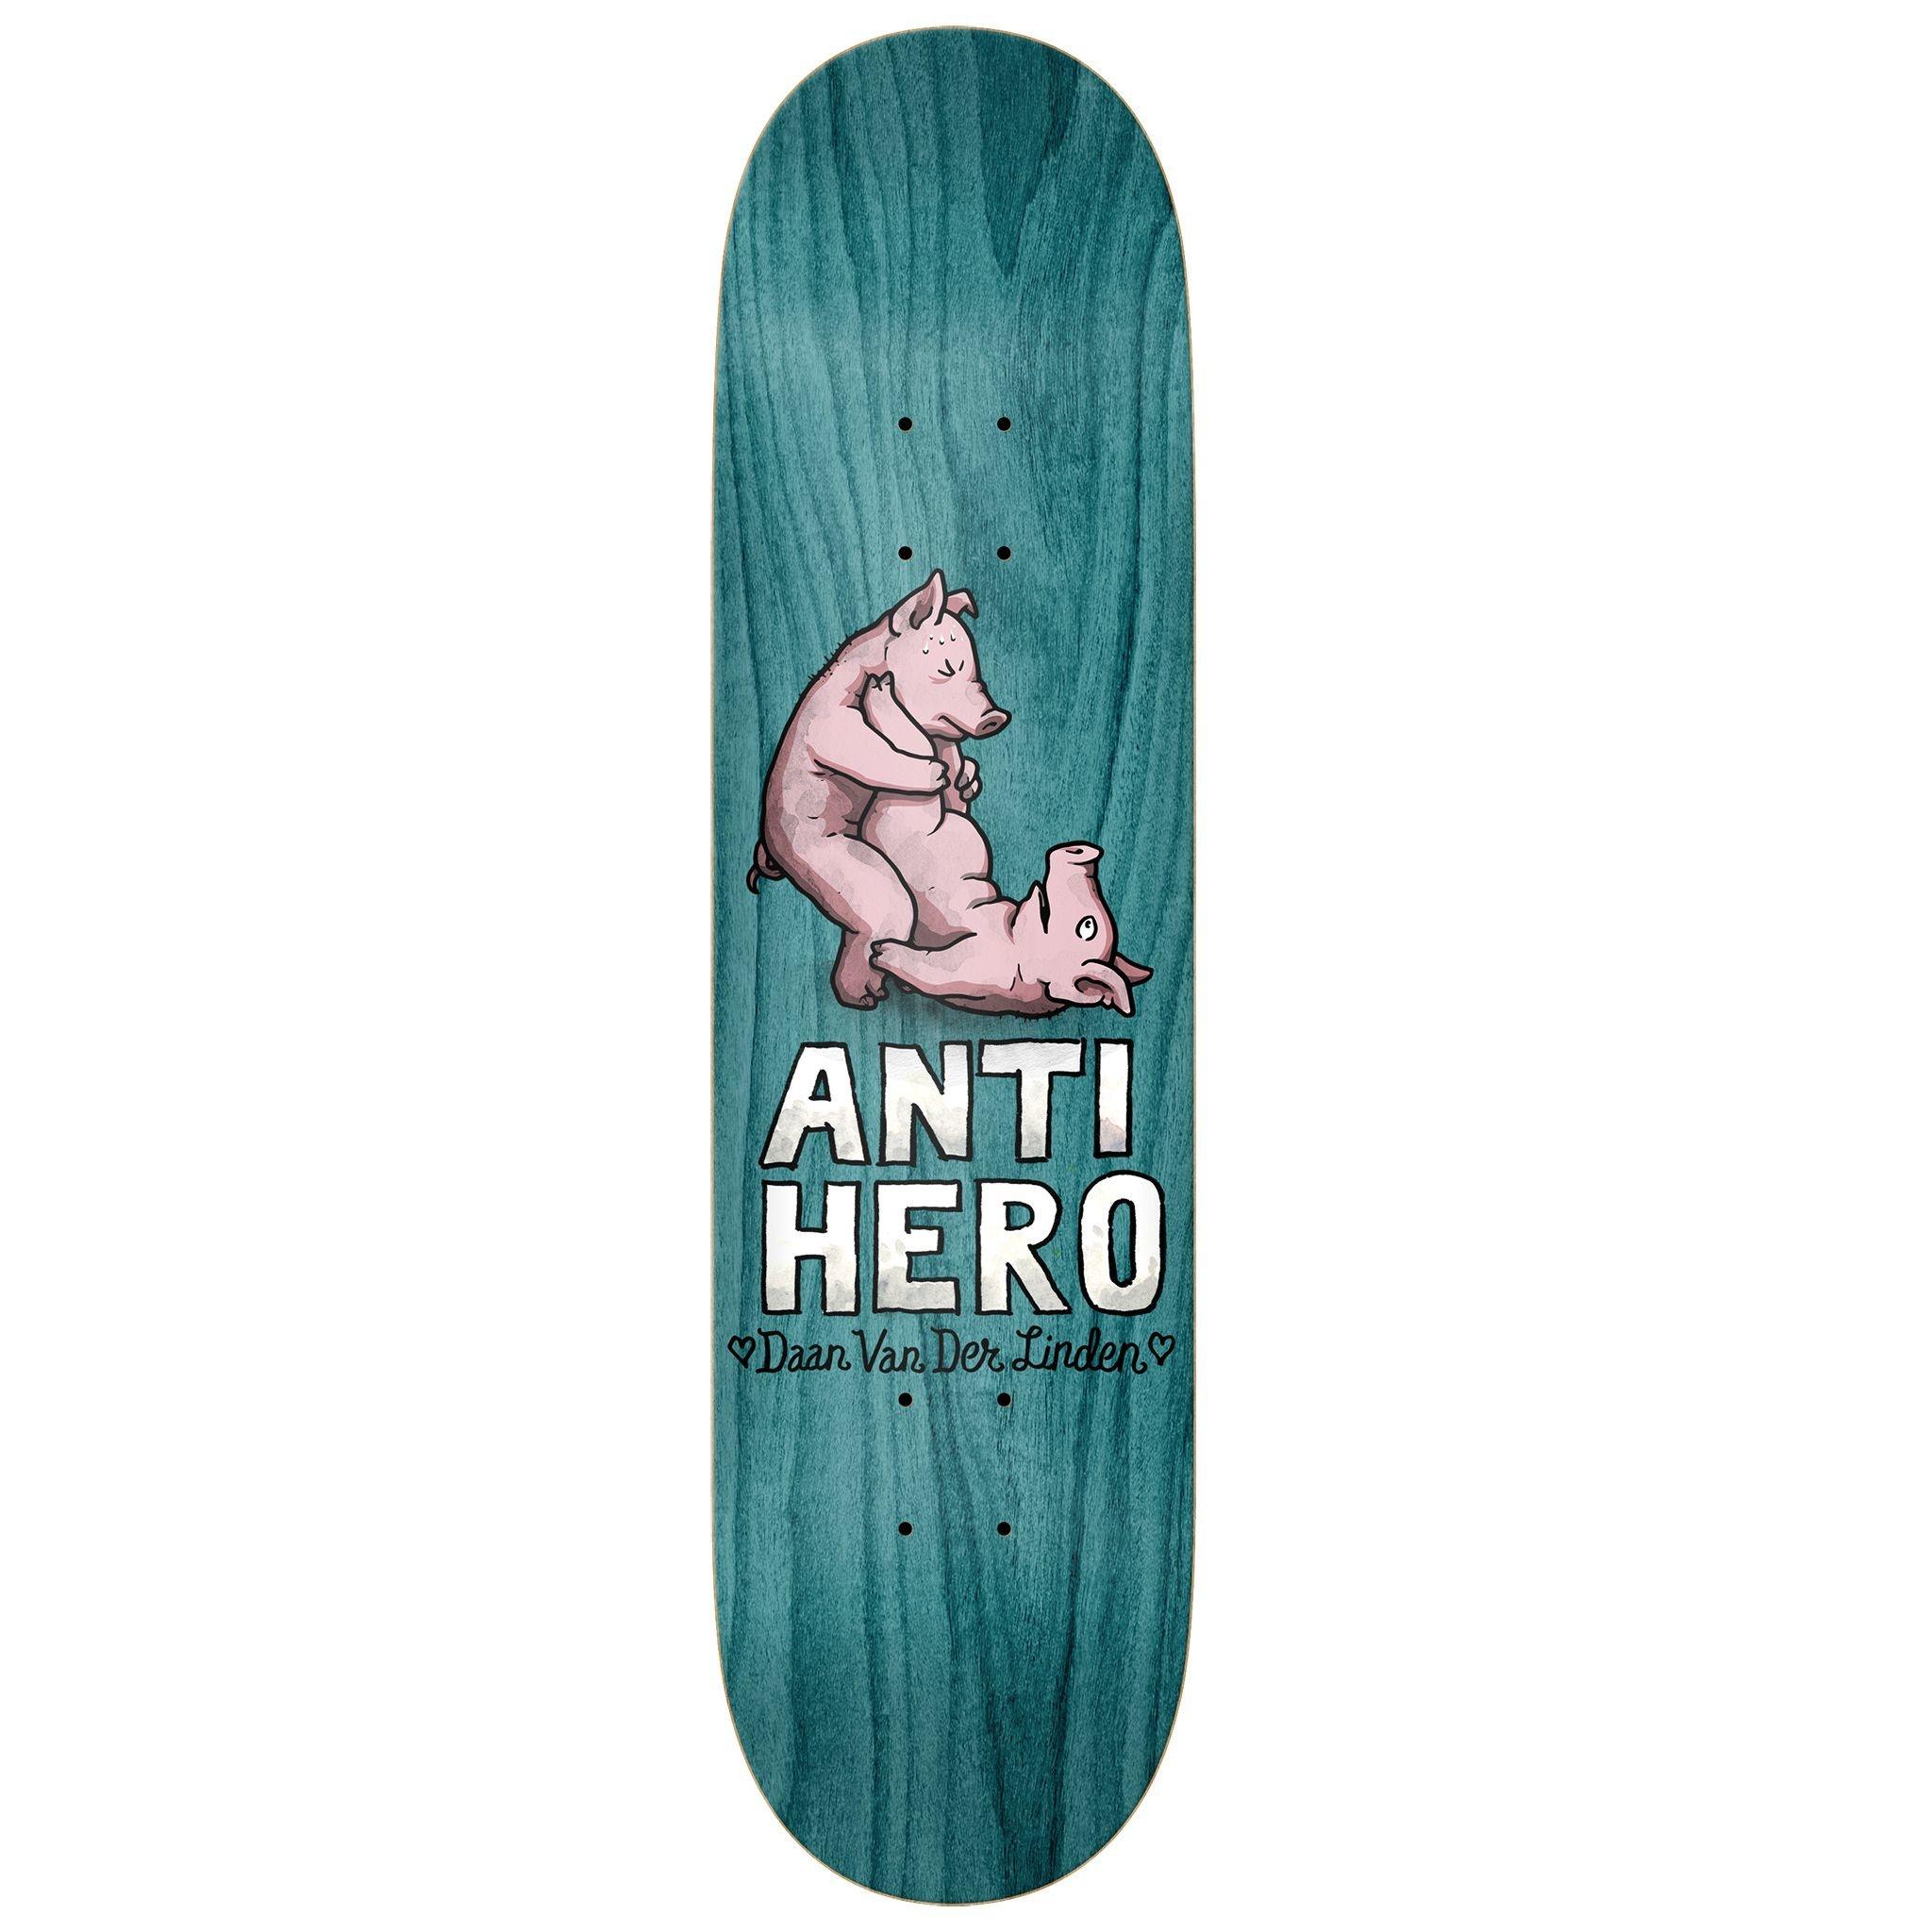 ANTIHERO ANTI HERO DAAN FOR LOVERS 8.38